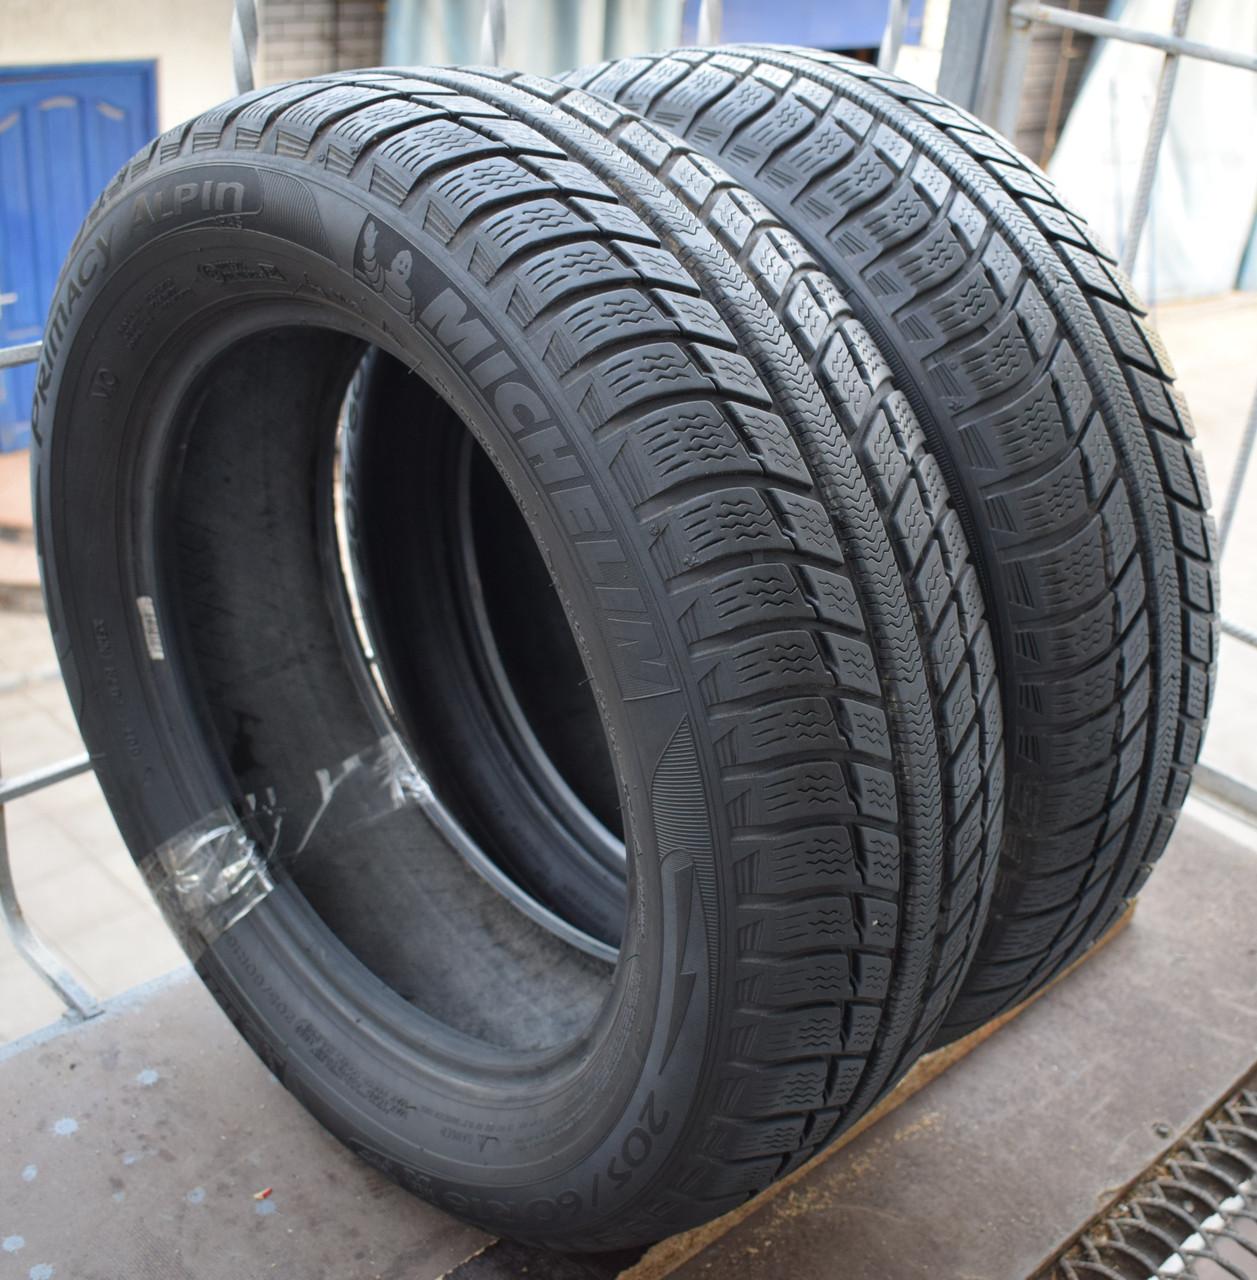 Шины б/у 205/60 R16 Michelin Primacy Alpin PA3, 6-6.5 мм, пара